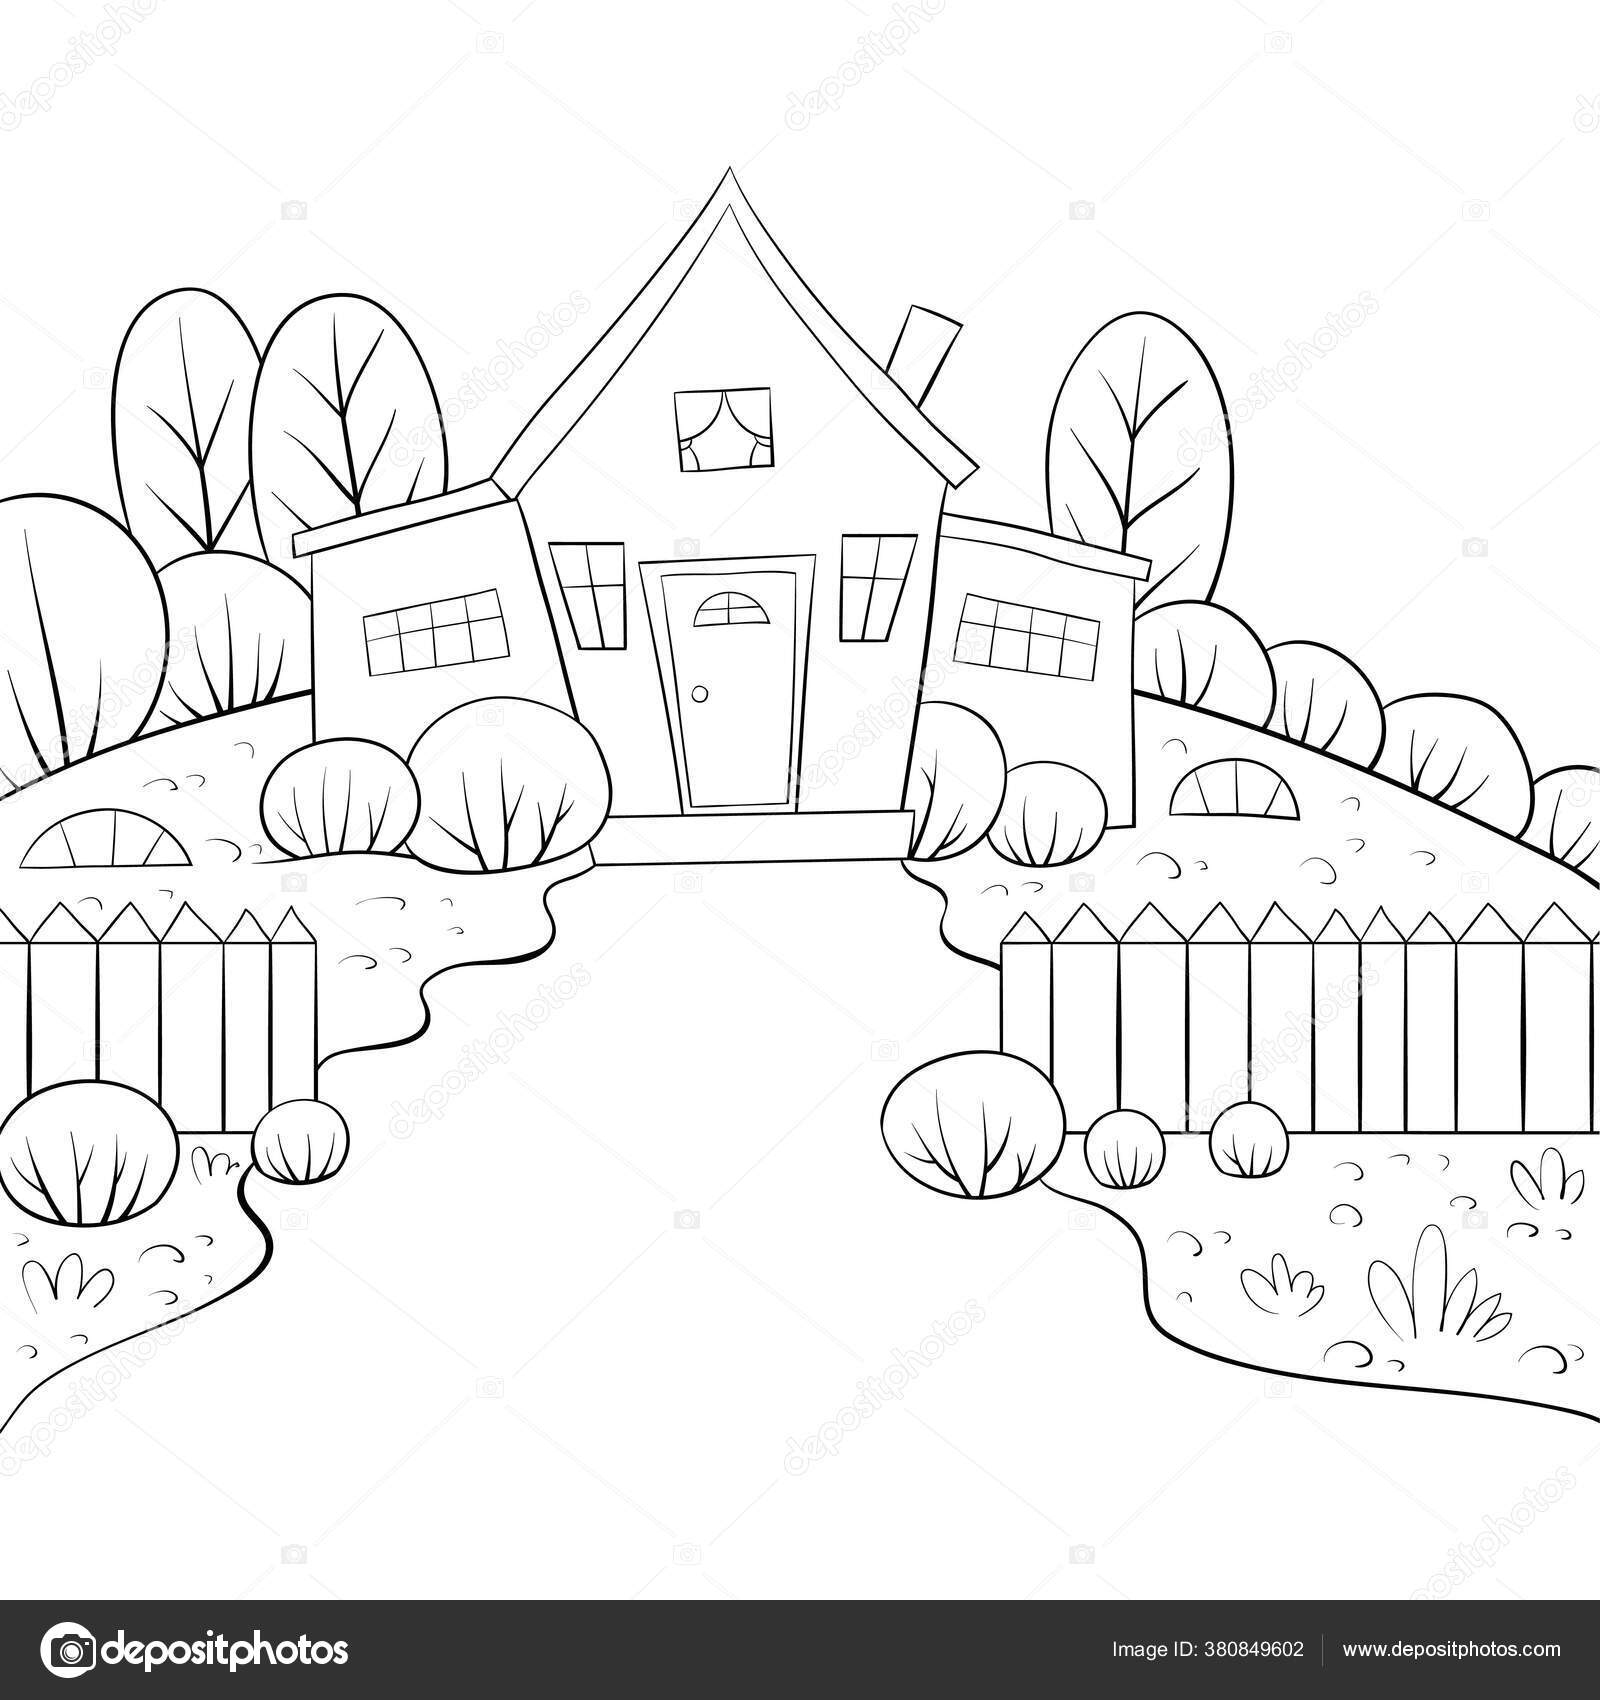 Pemandangan Alam Dengan Gambar Rumah Dan Pagar Untuk Kegiatan Santai Stok Vektor C Nonuzza 380849602